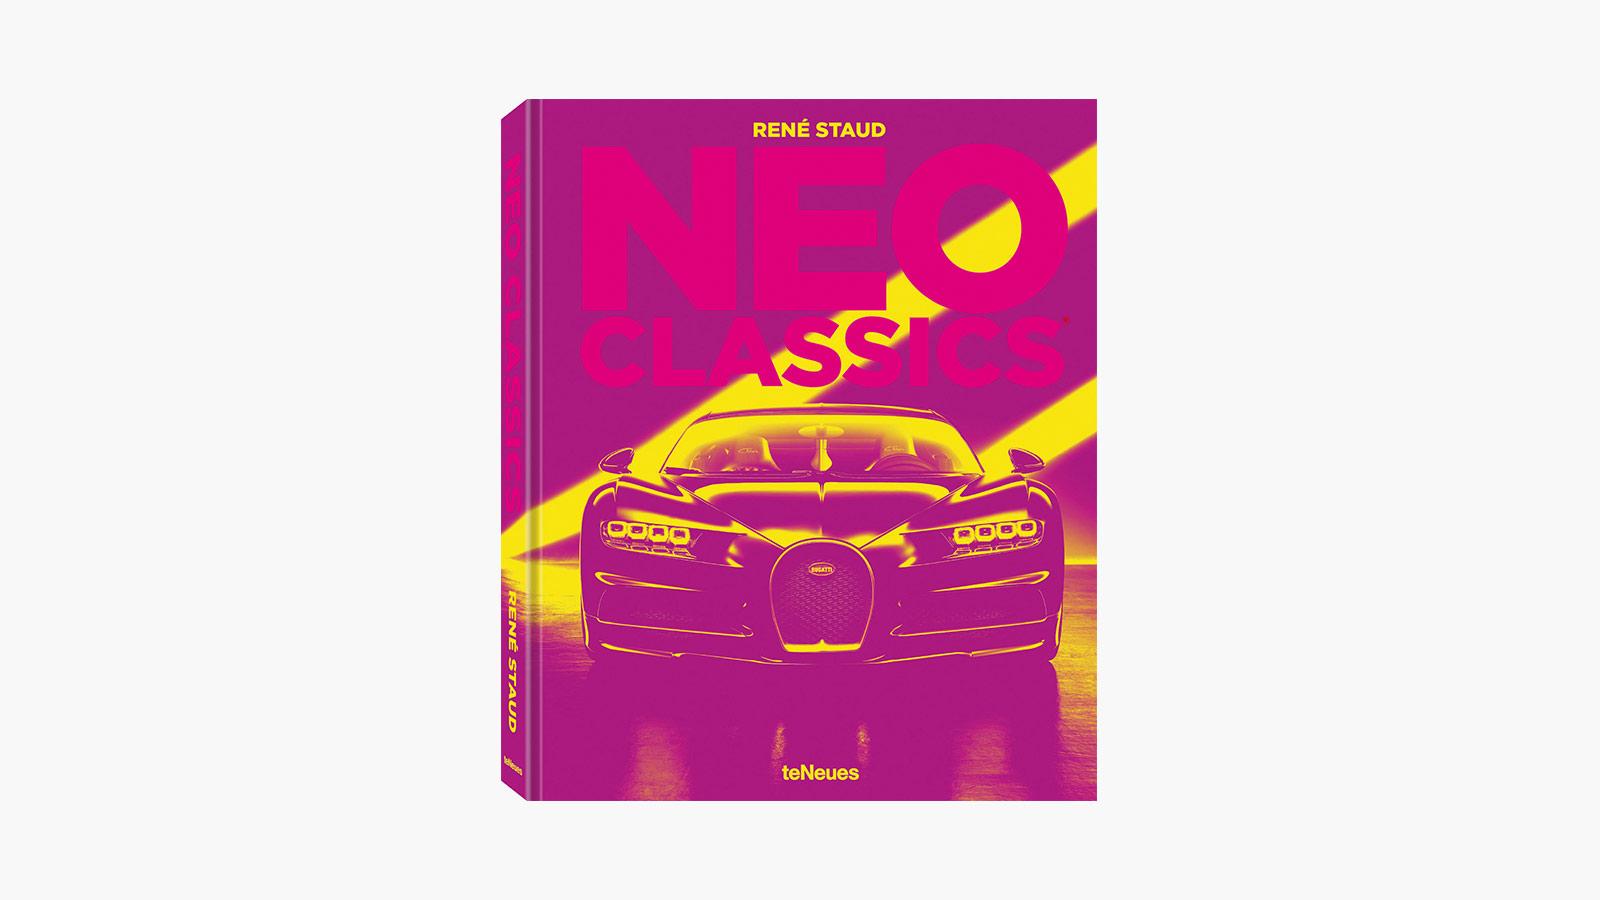 'Neo Classics' by René Staud & Jürgen Lewandowski